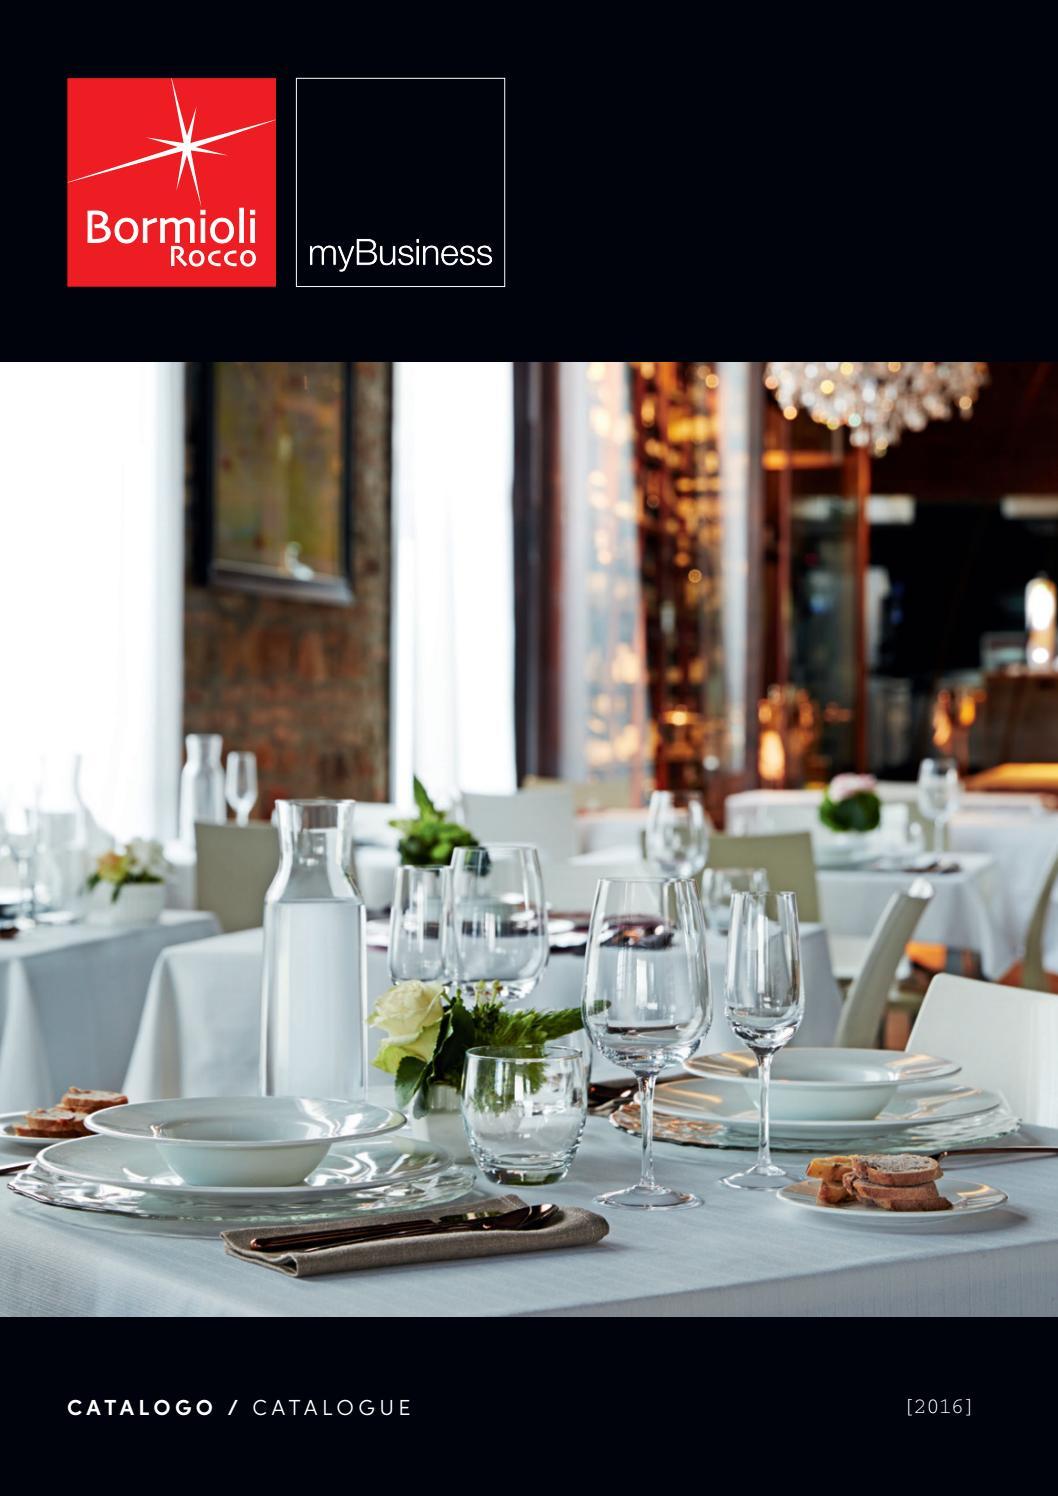 bormioli mybusiness catalogo 2016 by olivia gavira issuu. Black Bedroom Furniture Sets. Home Design Ideas